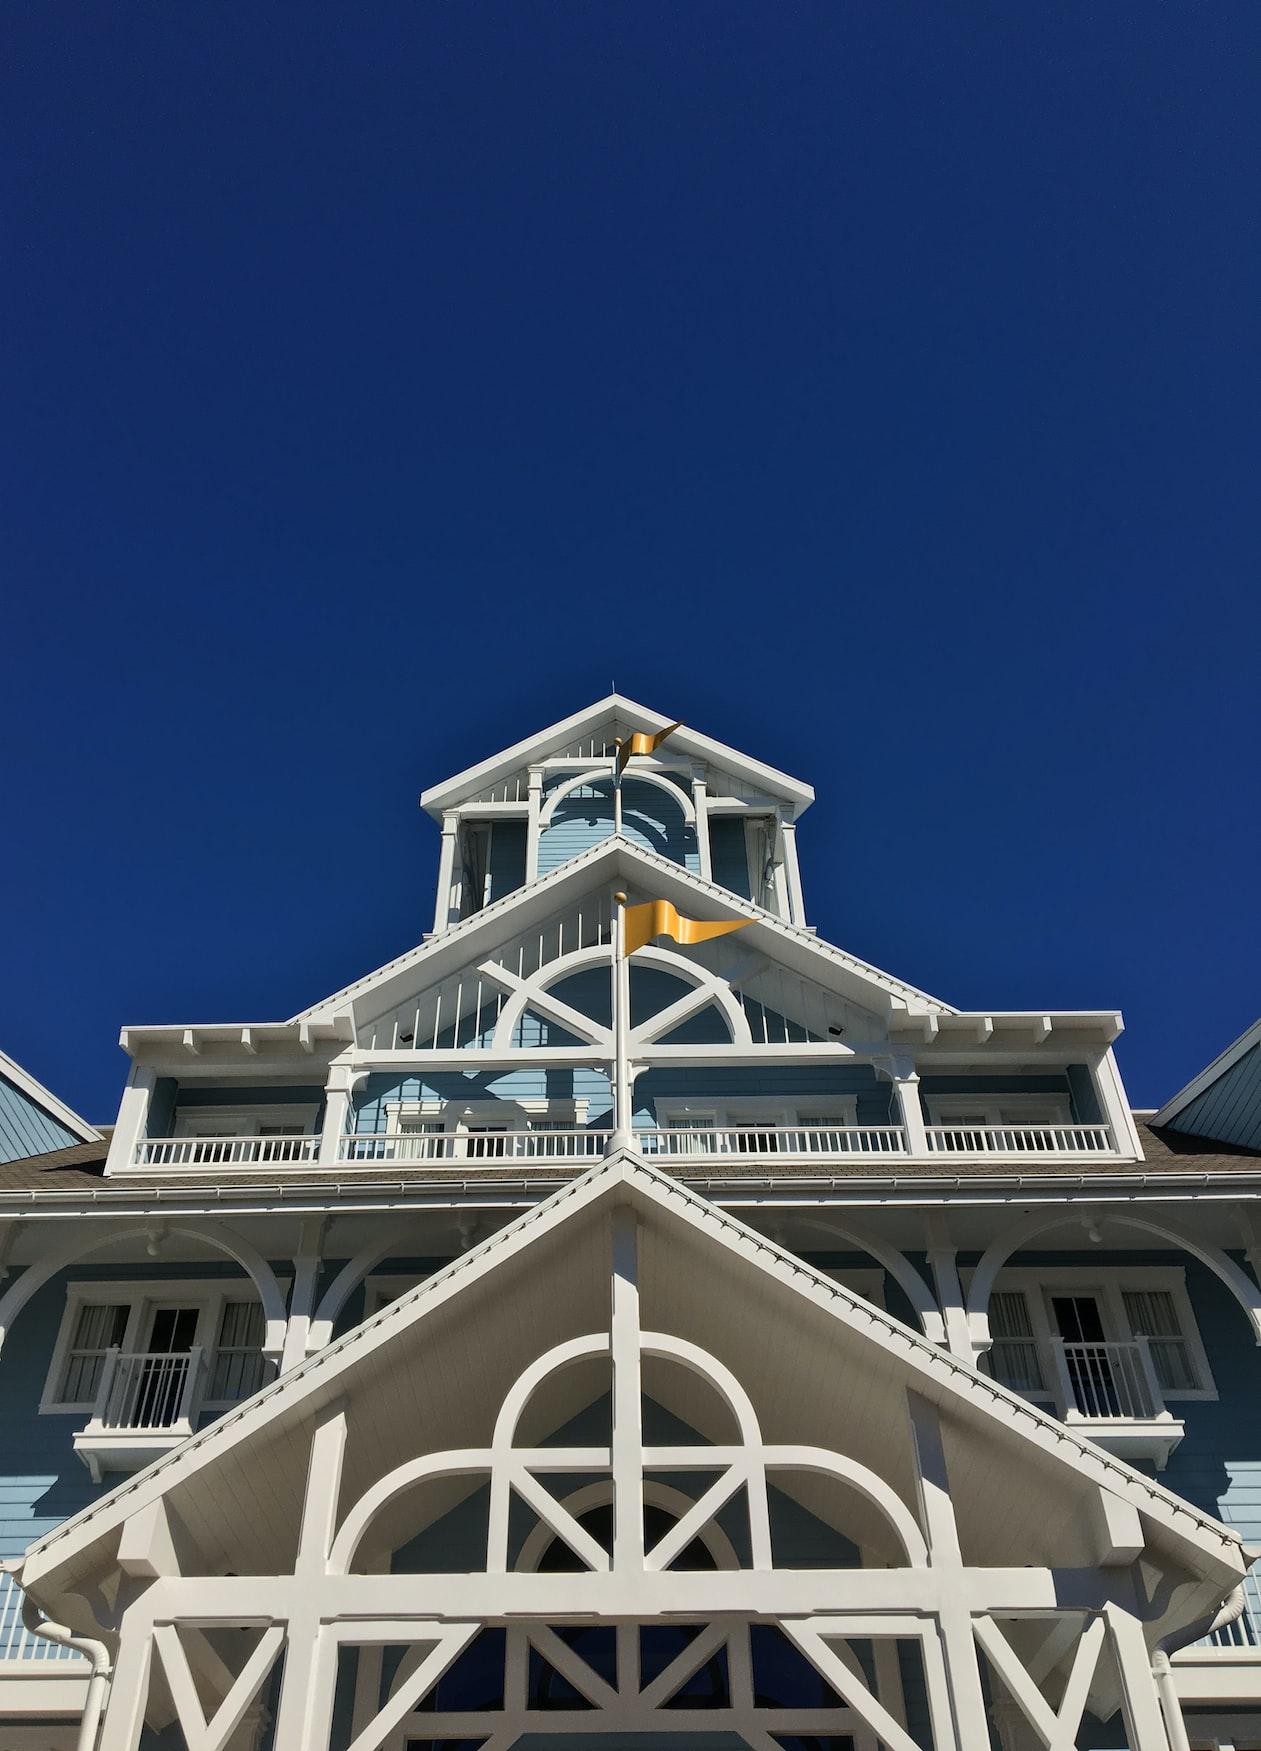 Disney Beach Club Resort exterior